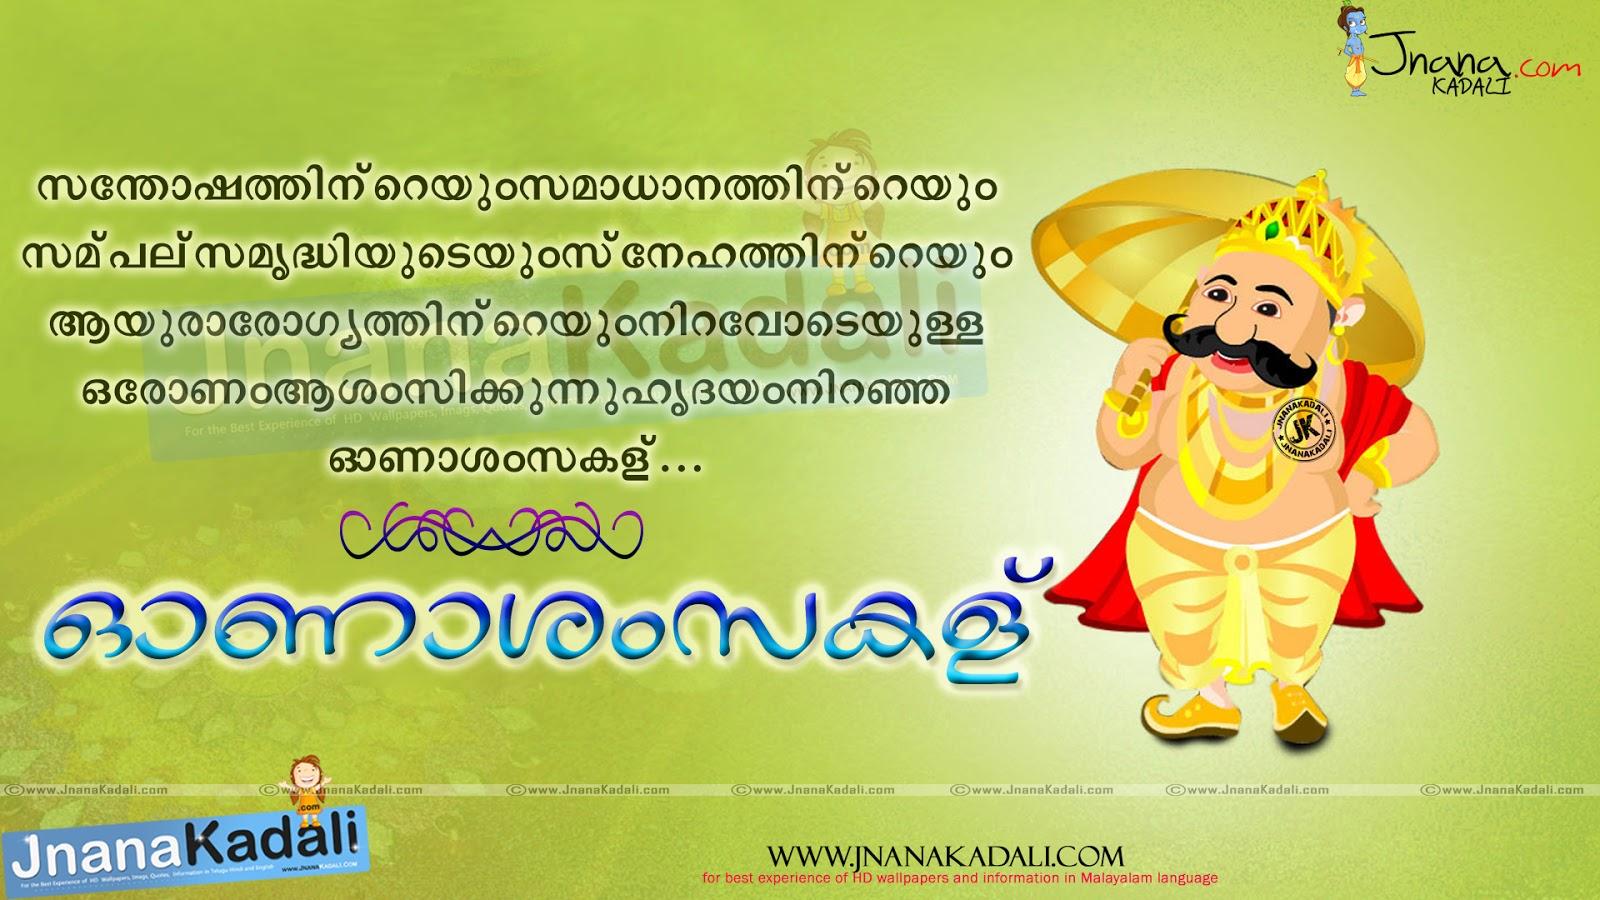 atham greetings in malayalam images - greetings card design simple